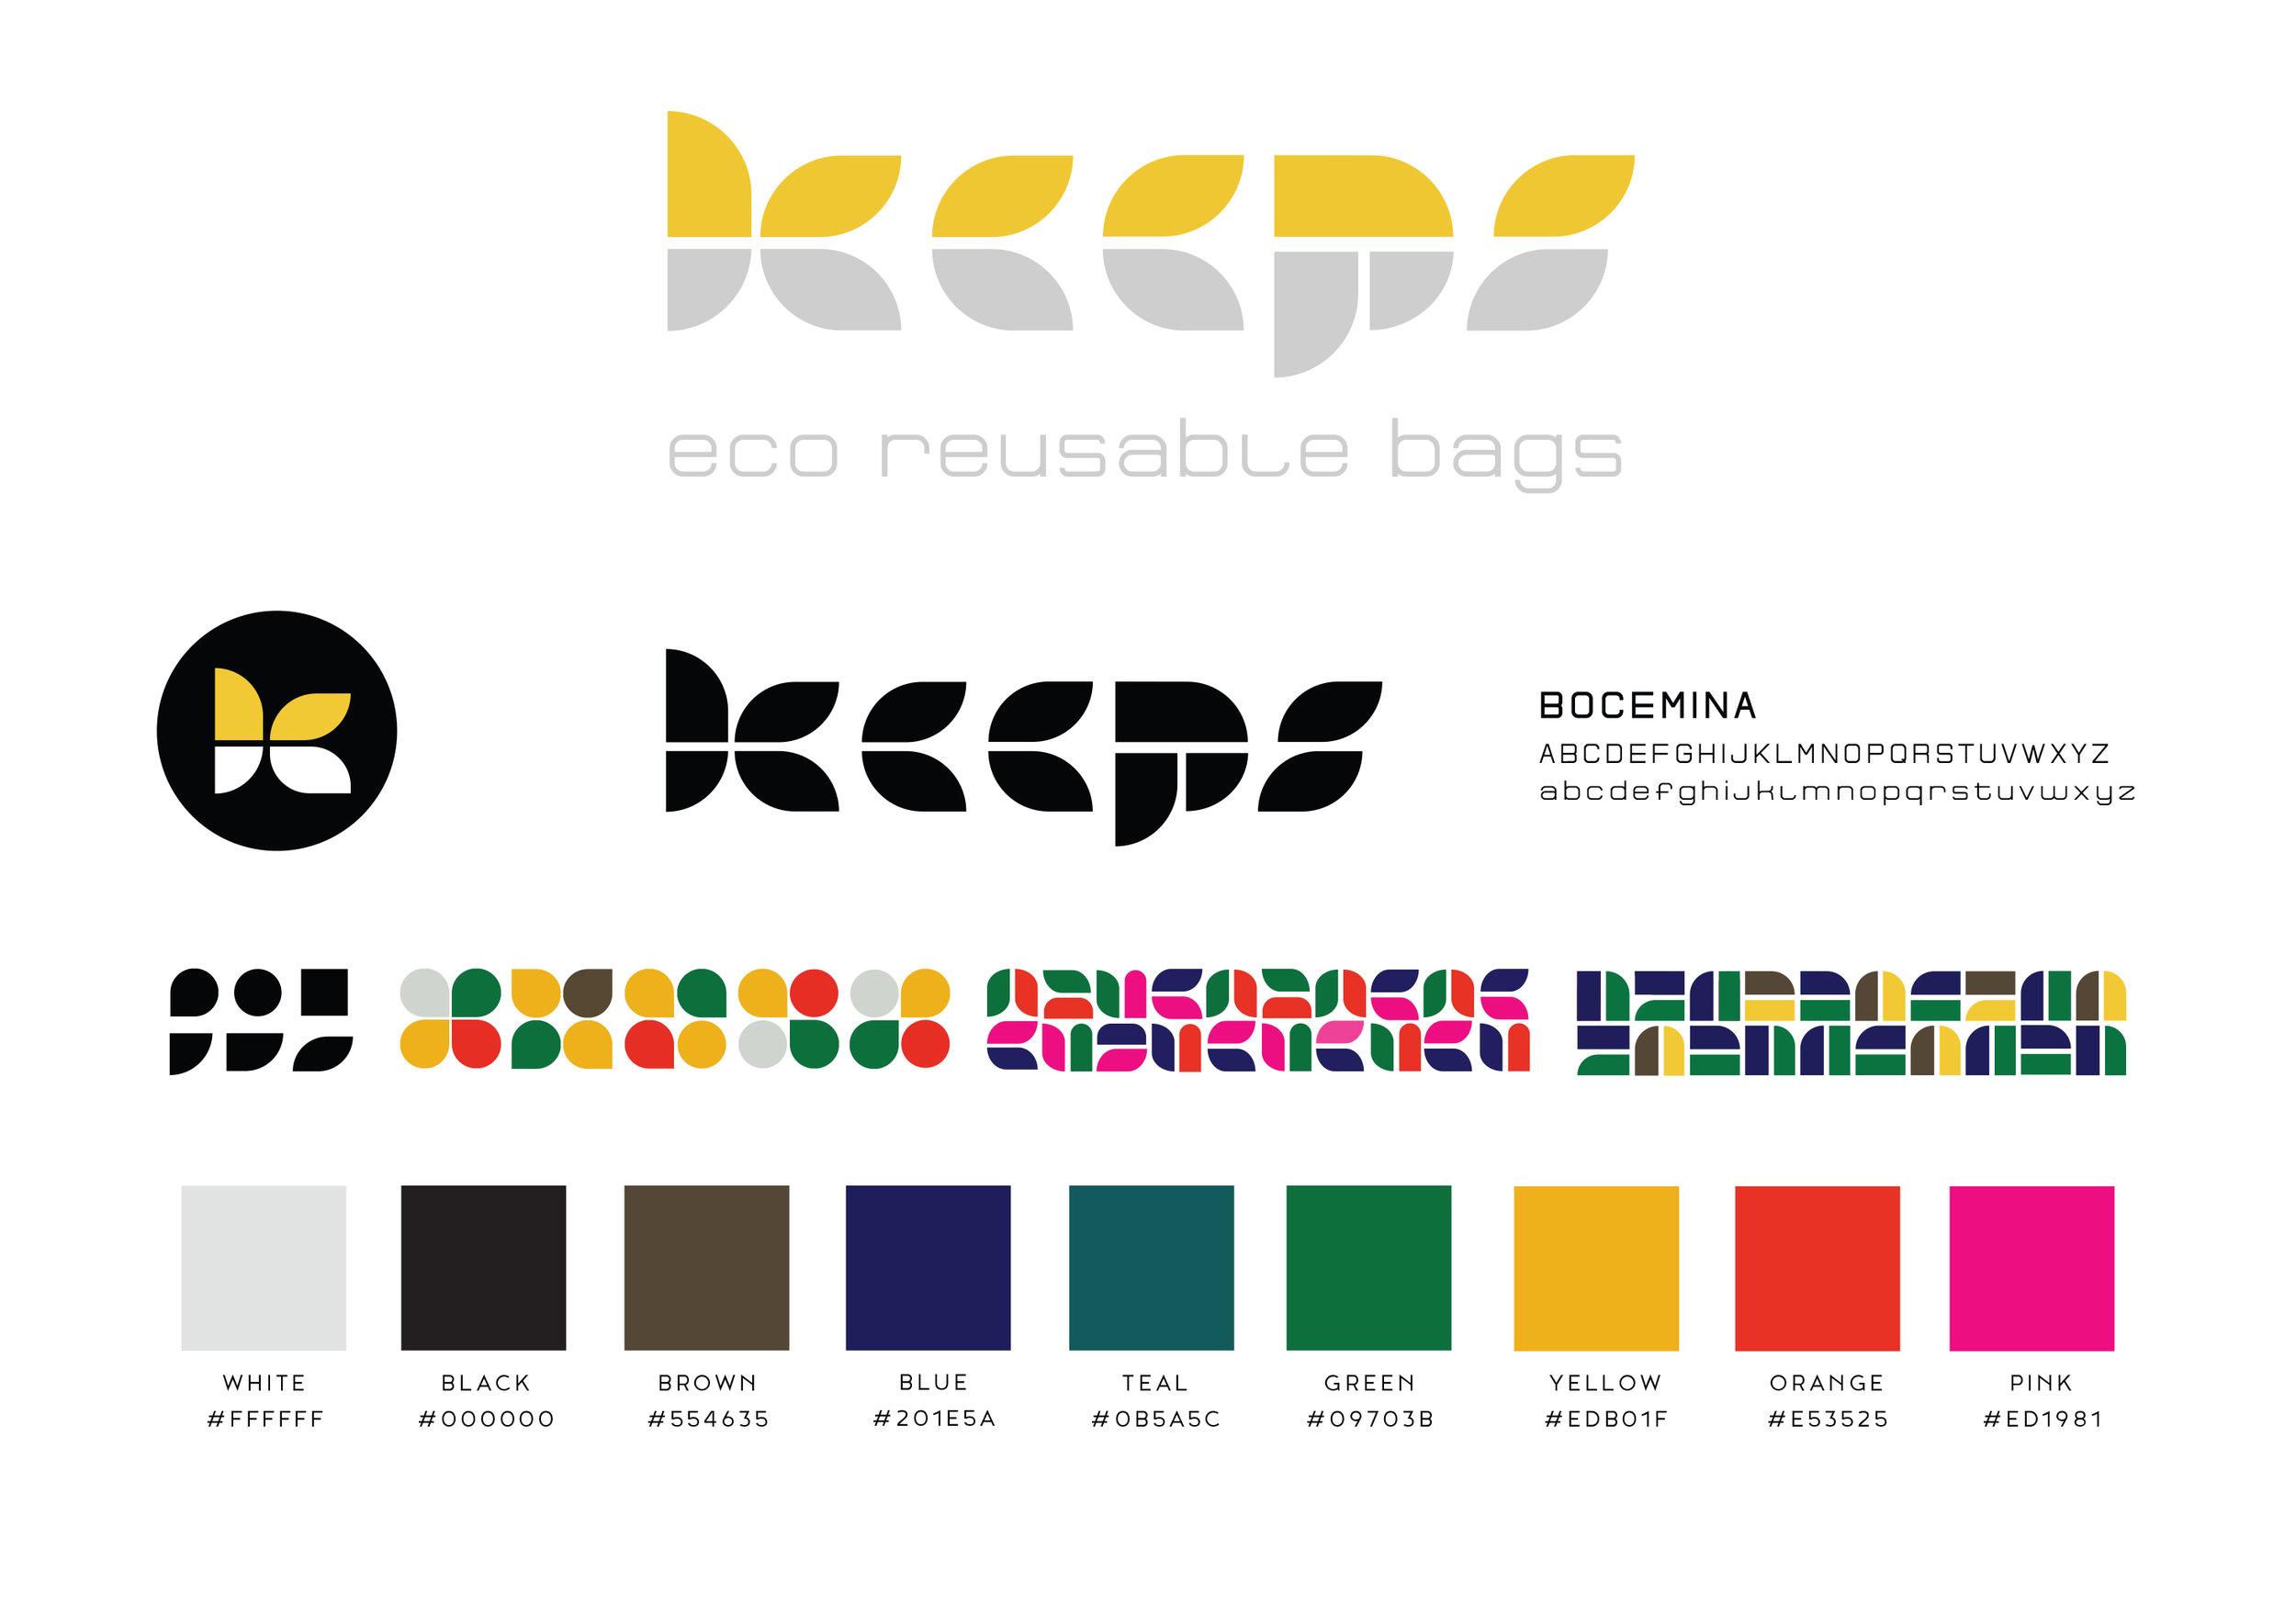 KEEPS_assetsportfolio_full.jpg